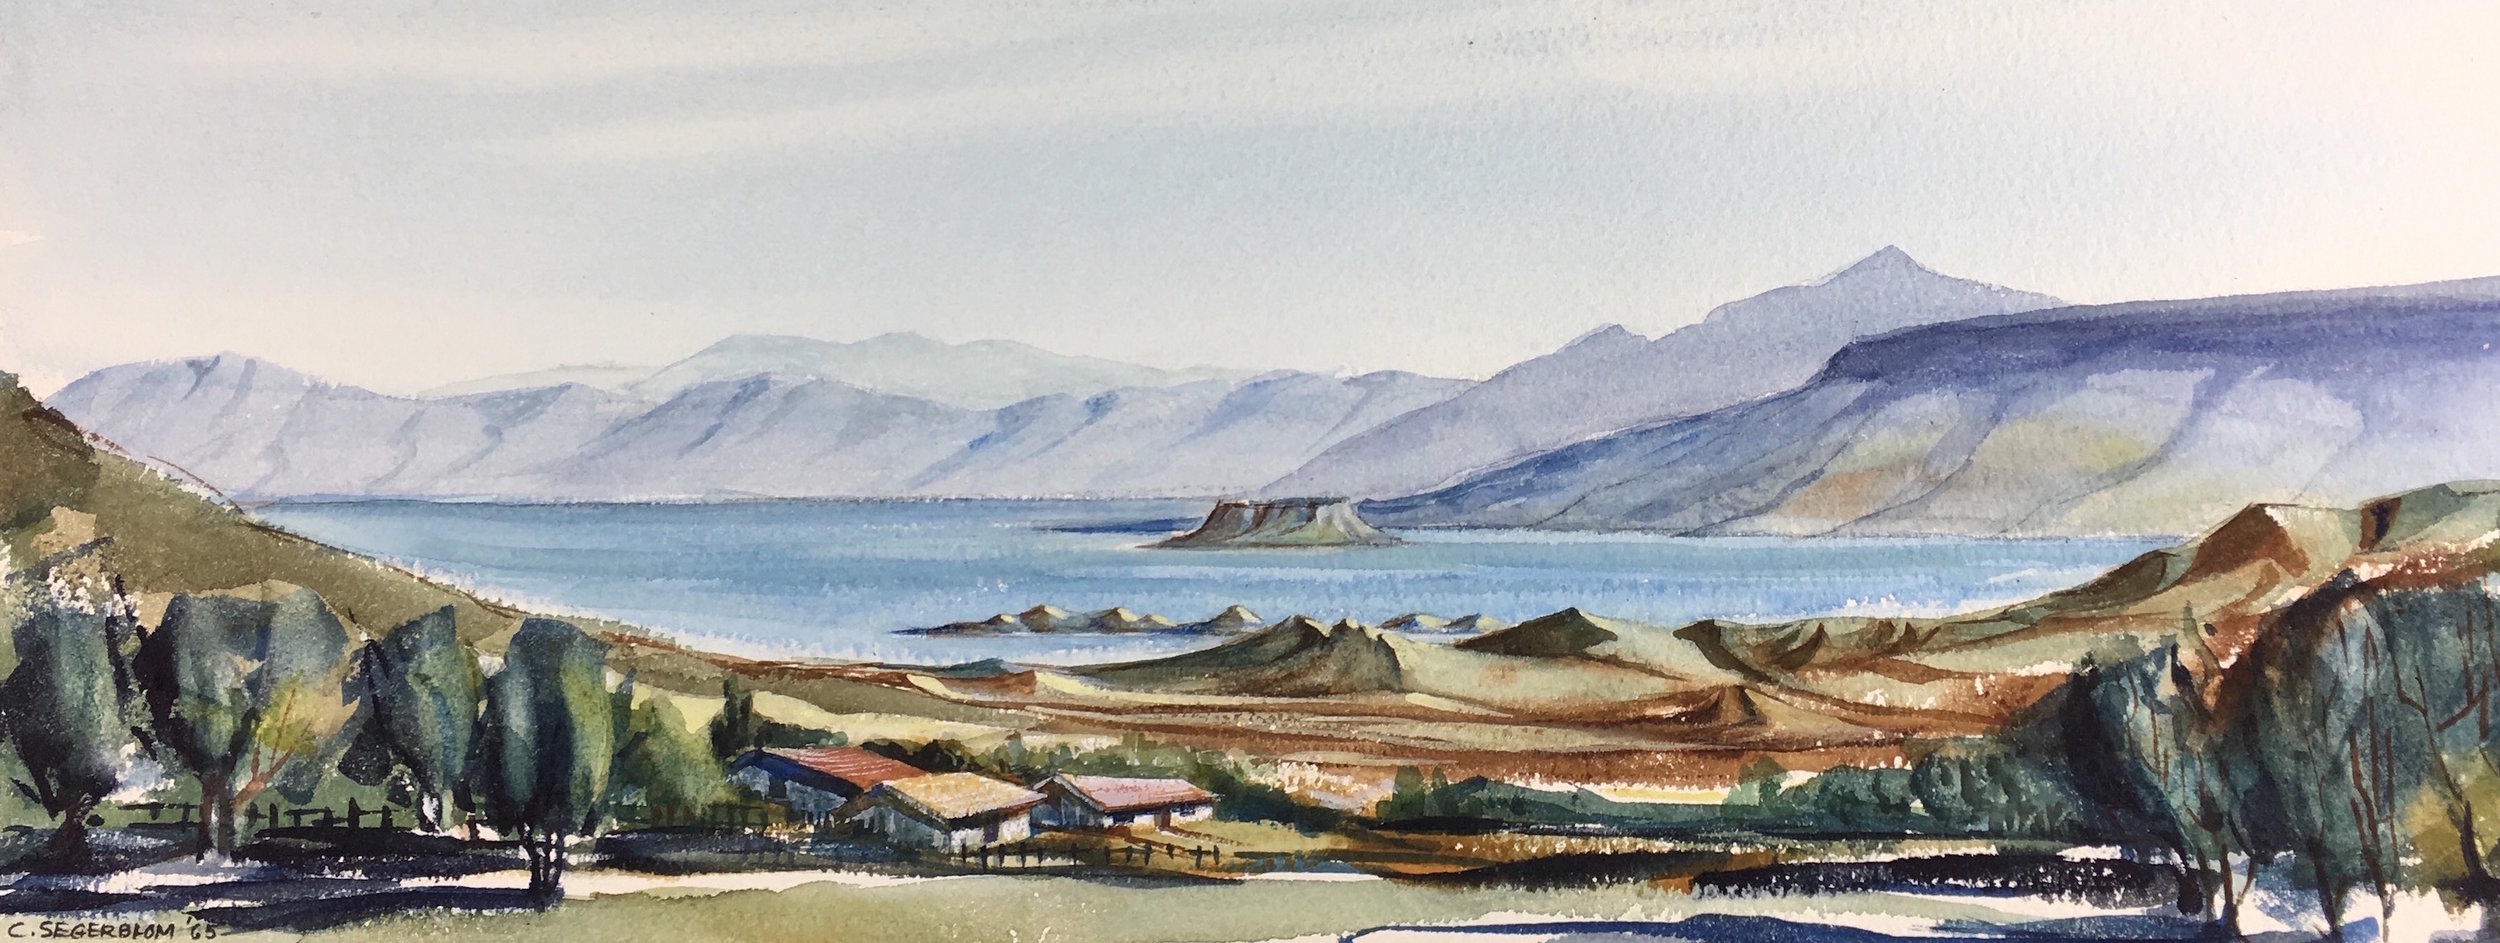 """Lake Mead,"" Cliff Segerblom, 1965 (Sold)"